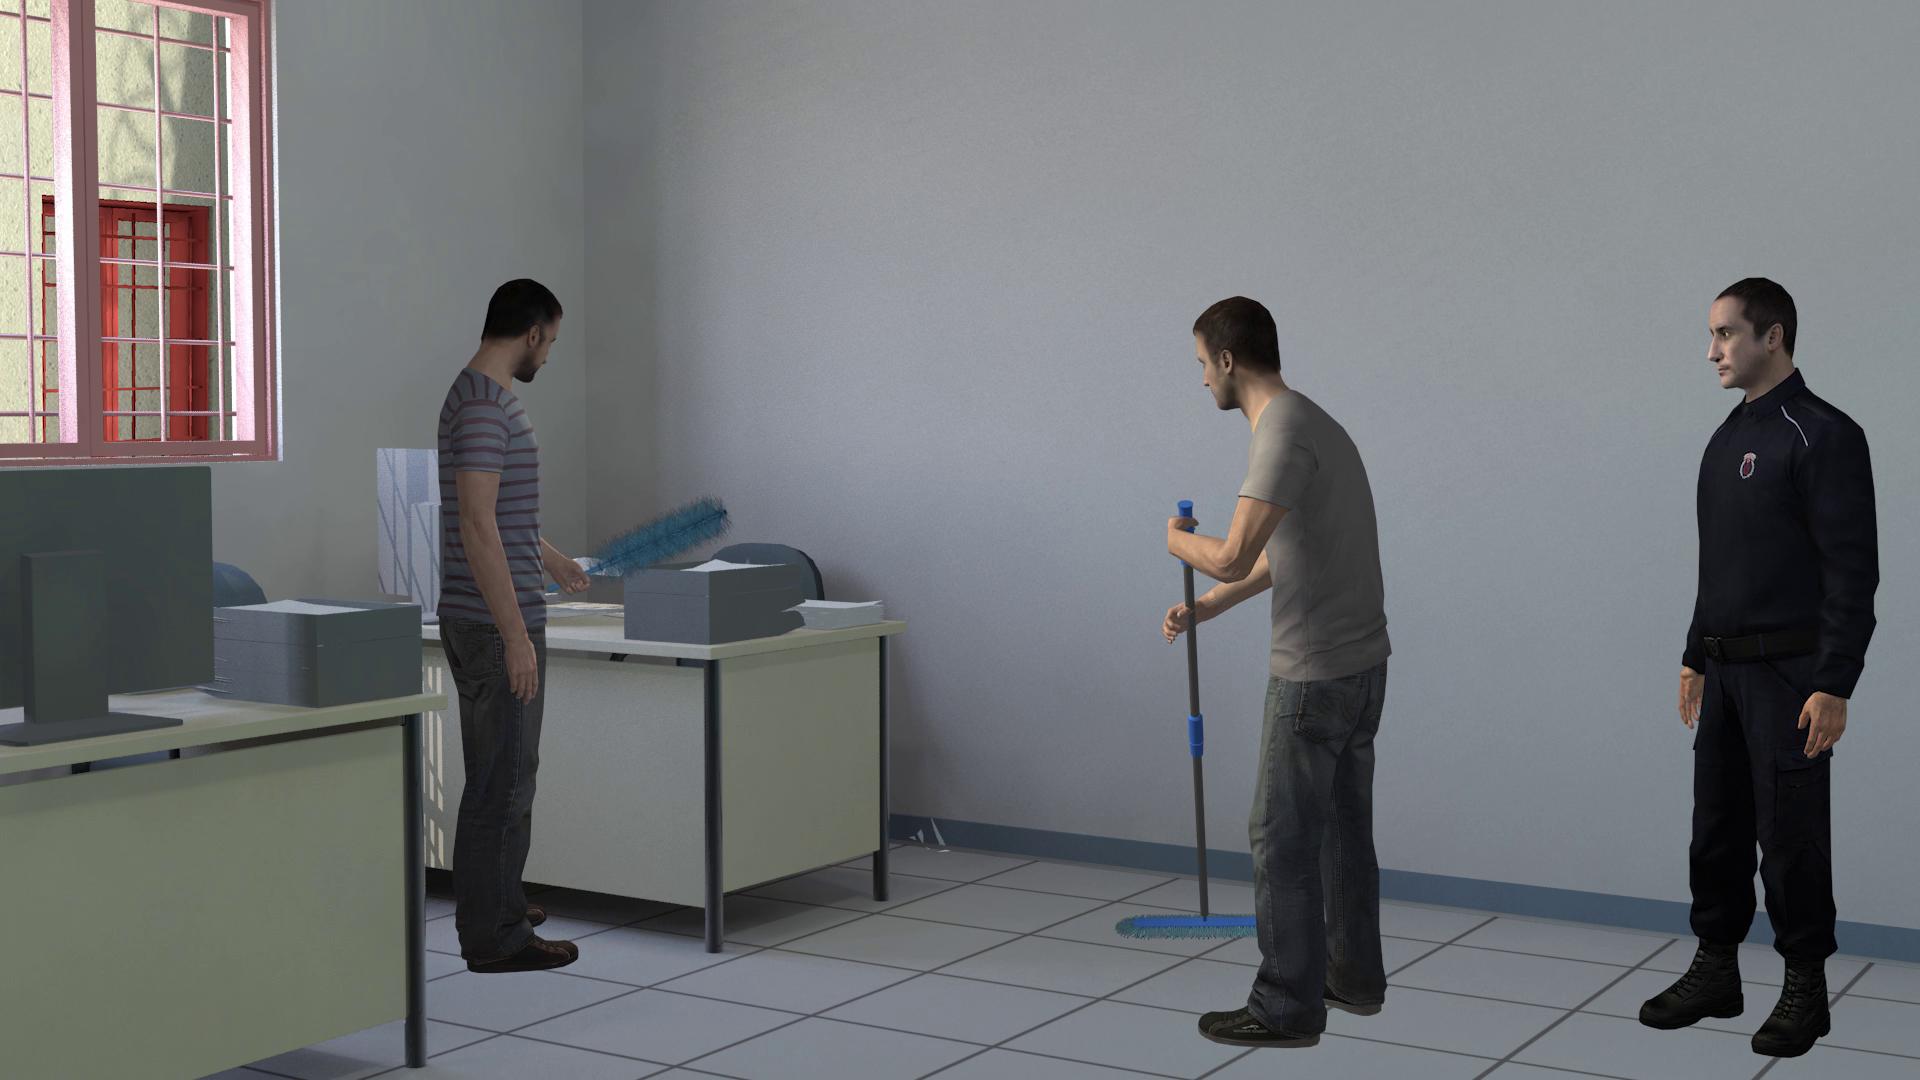 screenshot_prisonguard4